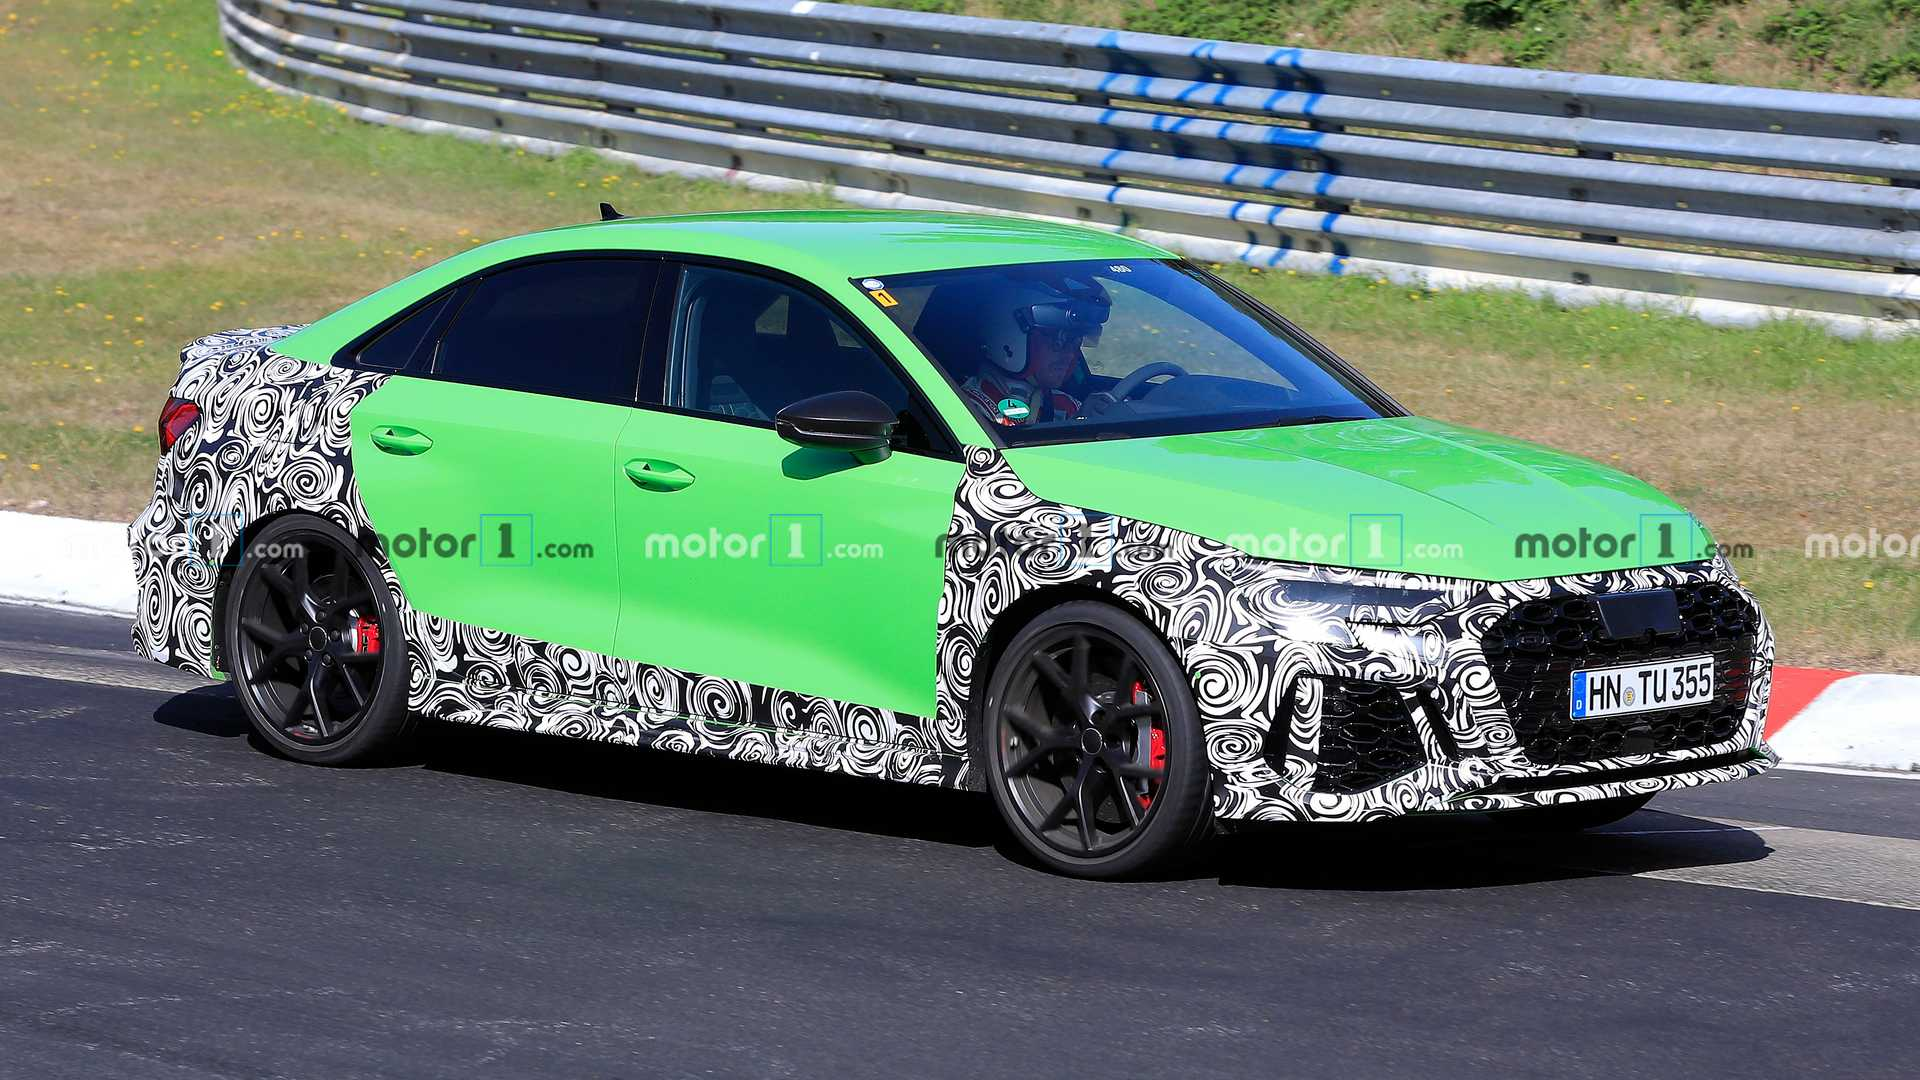 2021 Audi Rs3 Sedan Spied Hulking Out On The Nurburgring